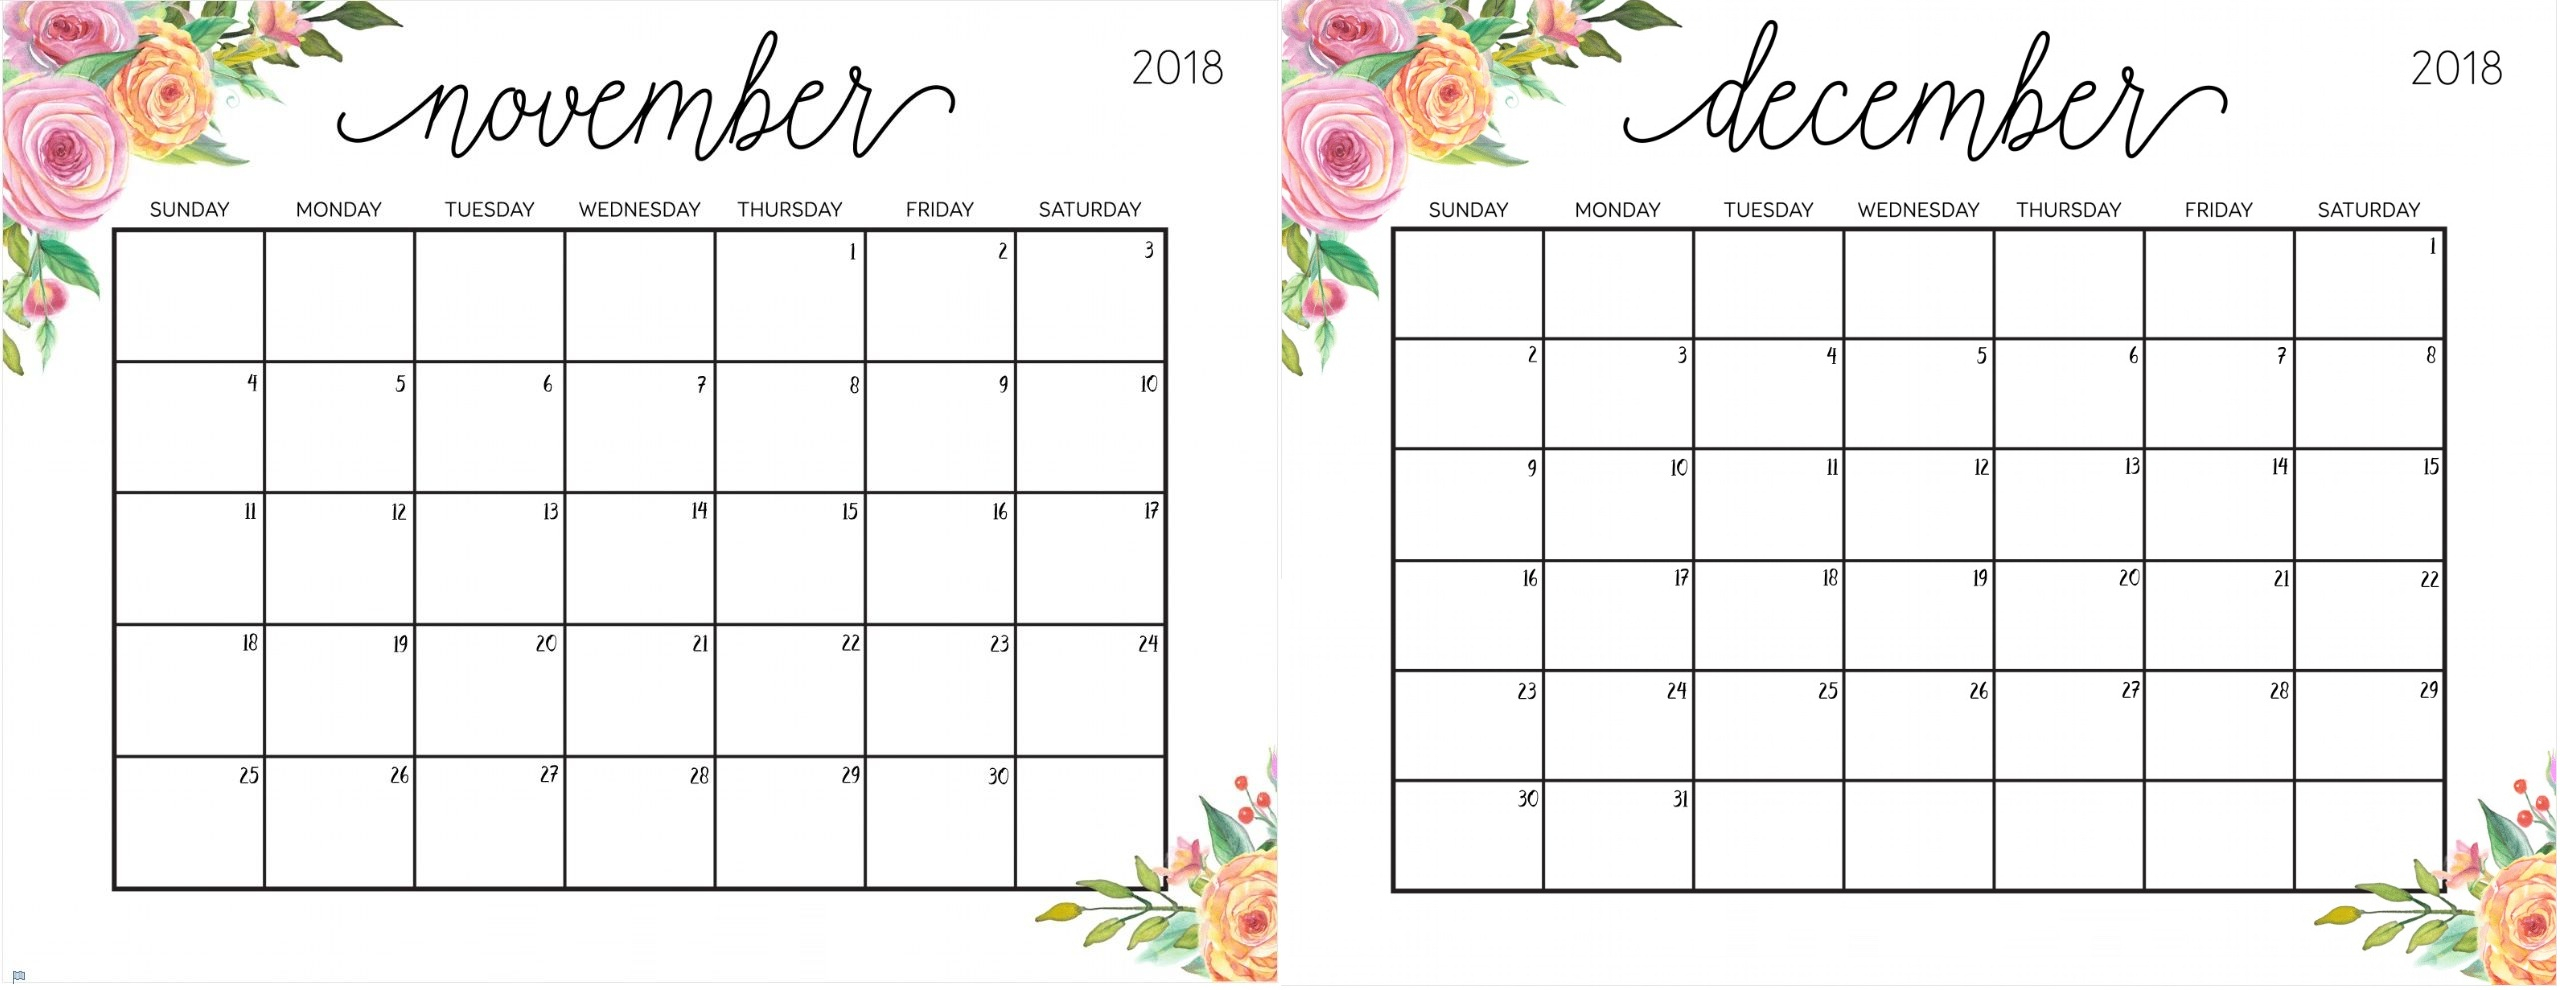 November December 2018 Calendar Printable Free - Printable Calendar intended for Blank Calendar For November And December